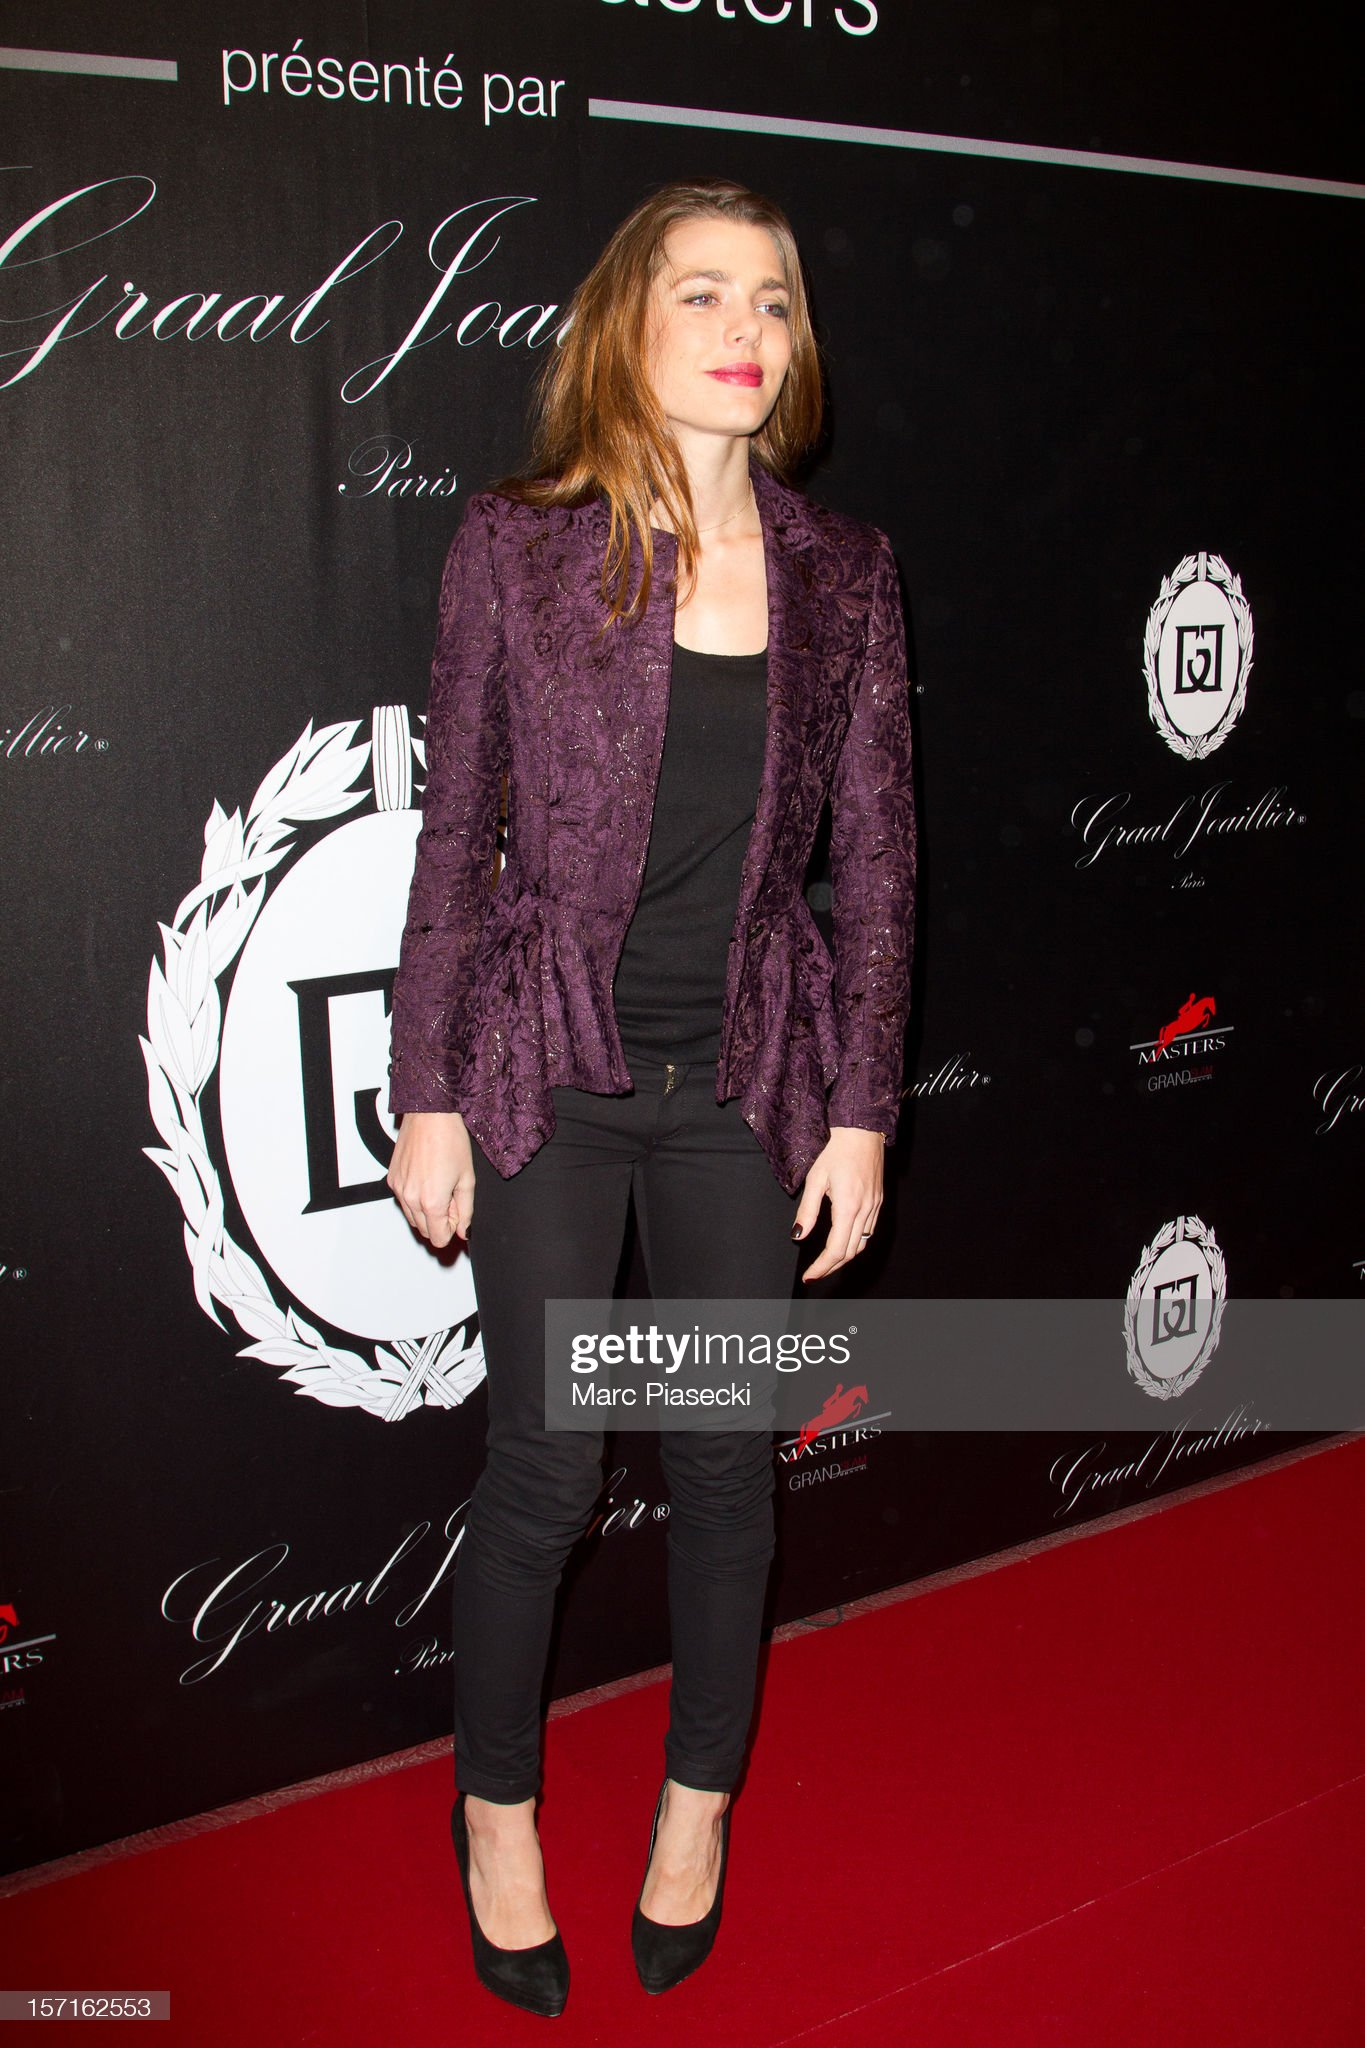 Gucci Paris Masters 2012 - Opening Gala : News Photo